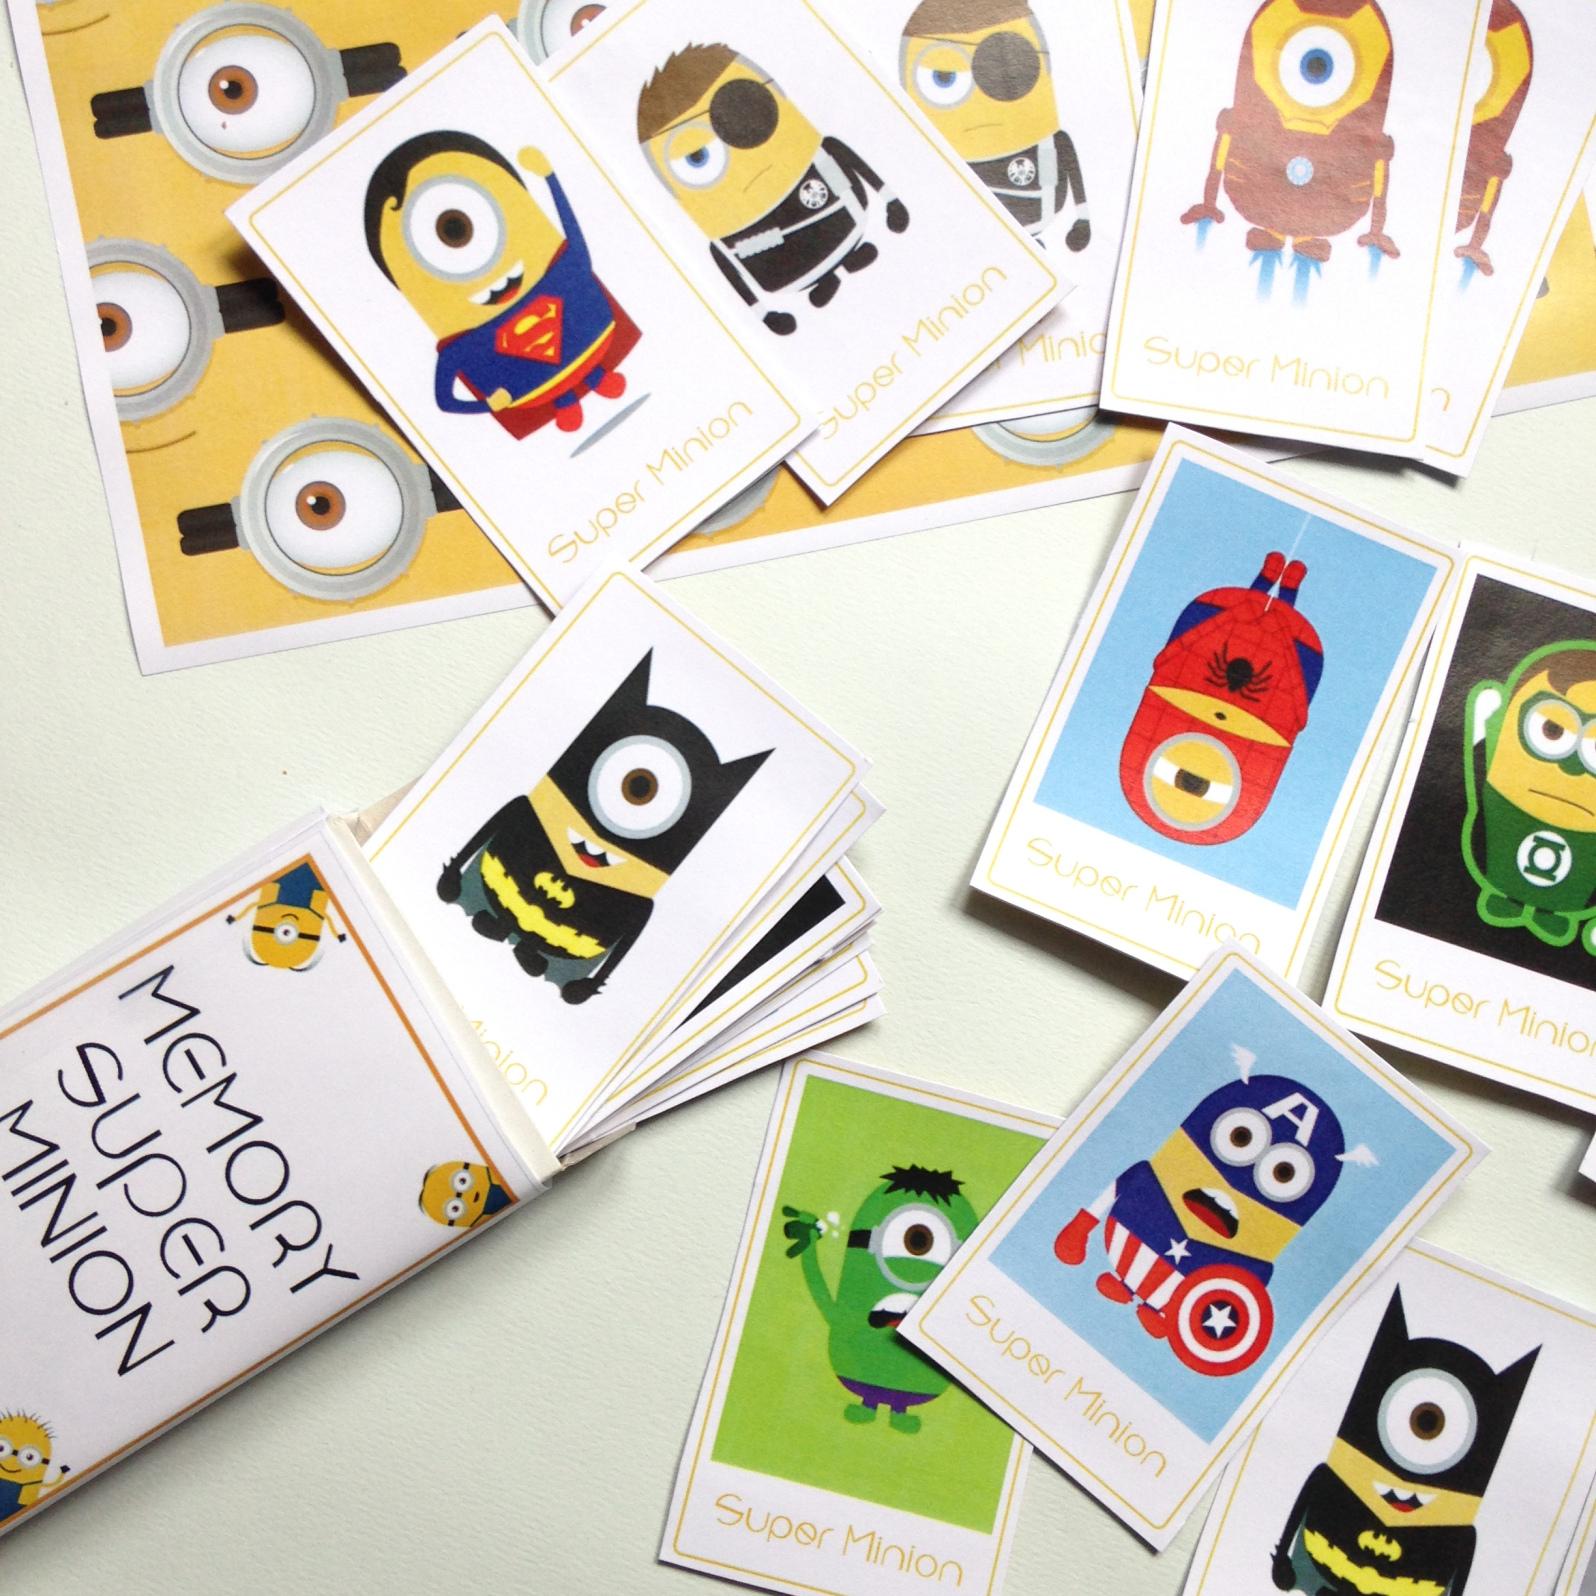 Minion Memory Game from Wonder Kids